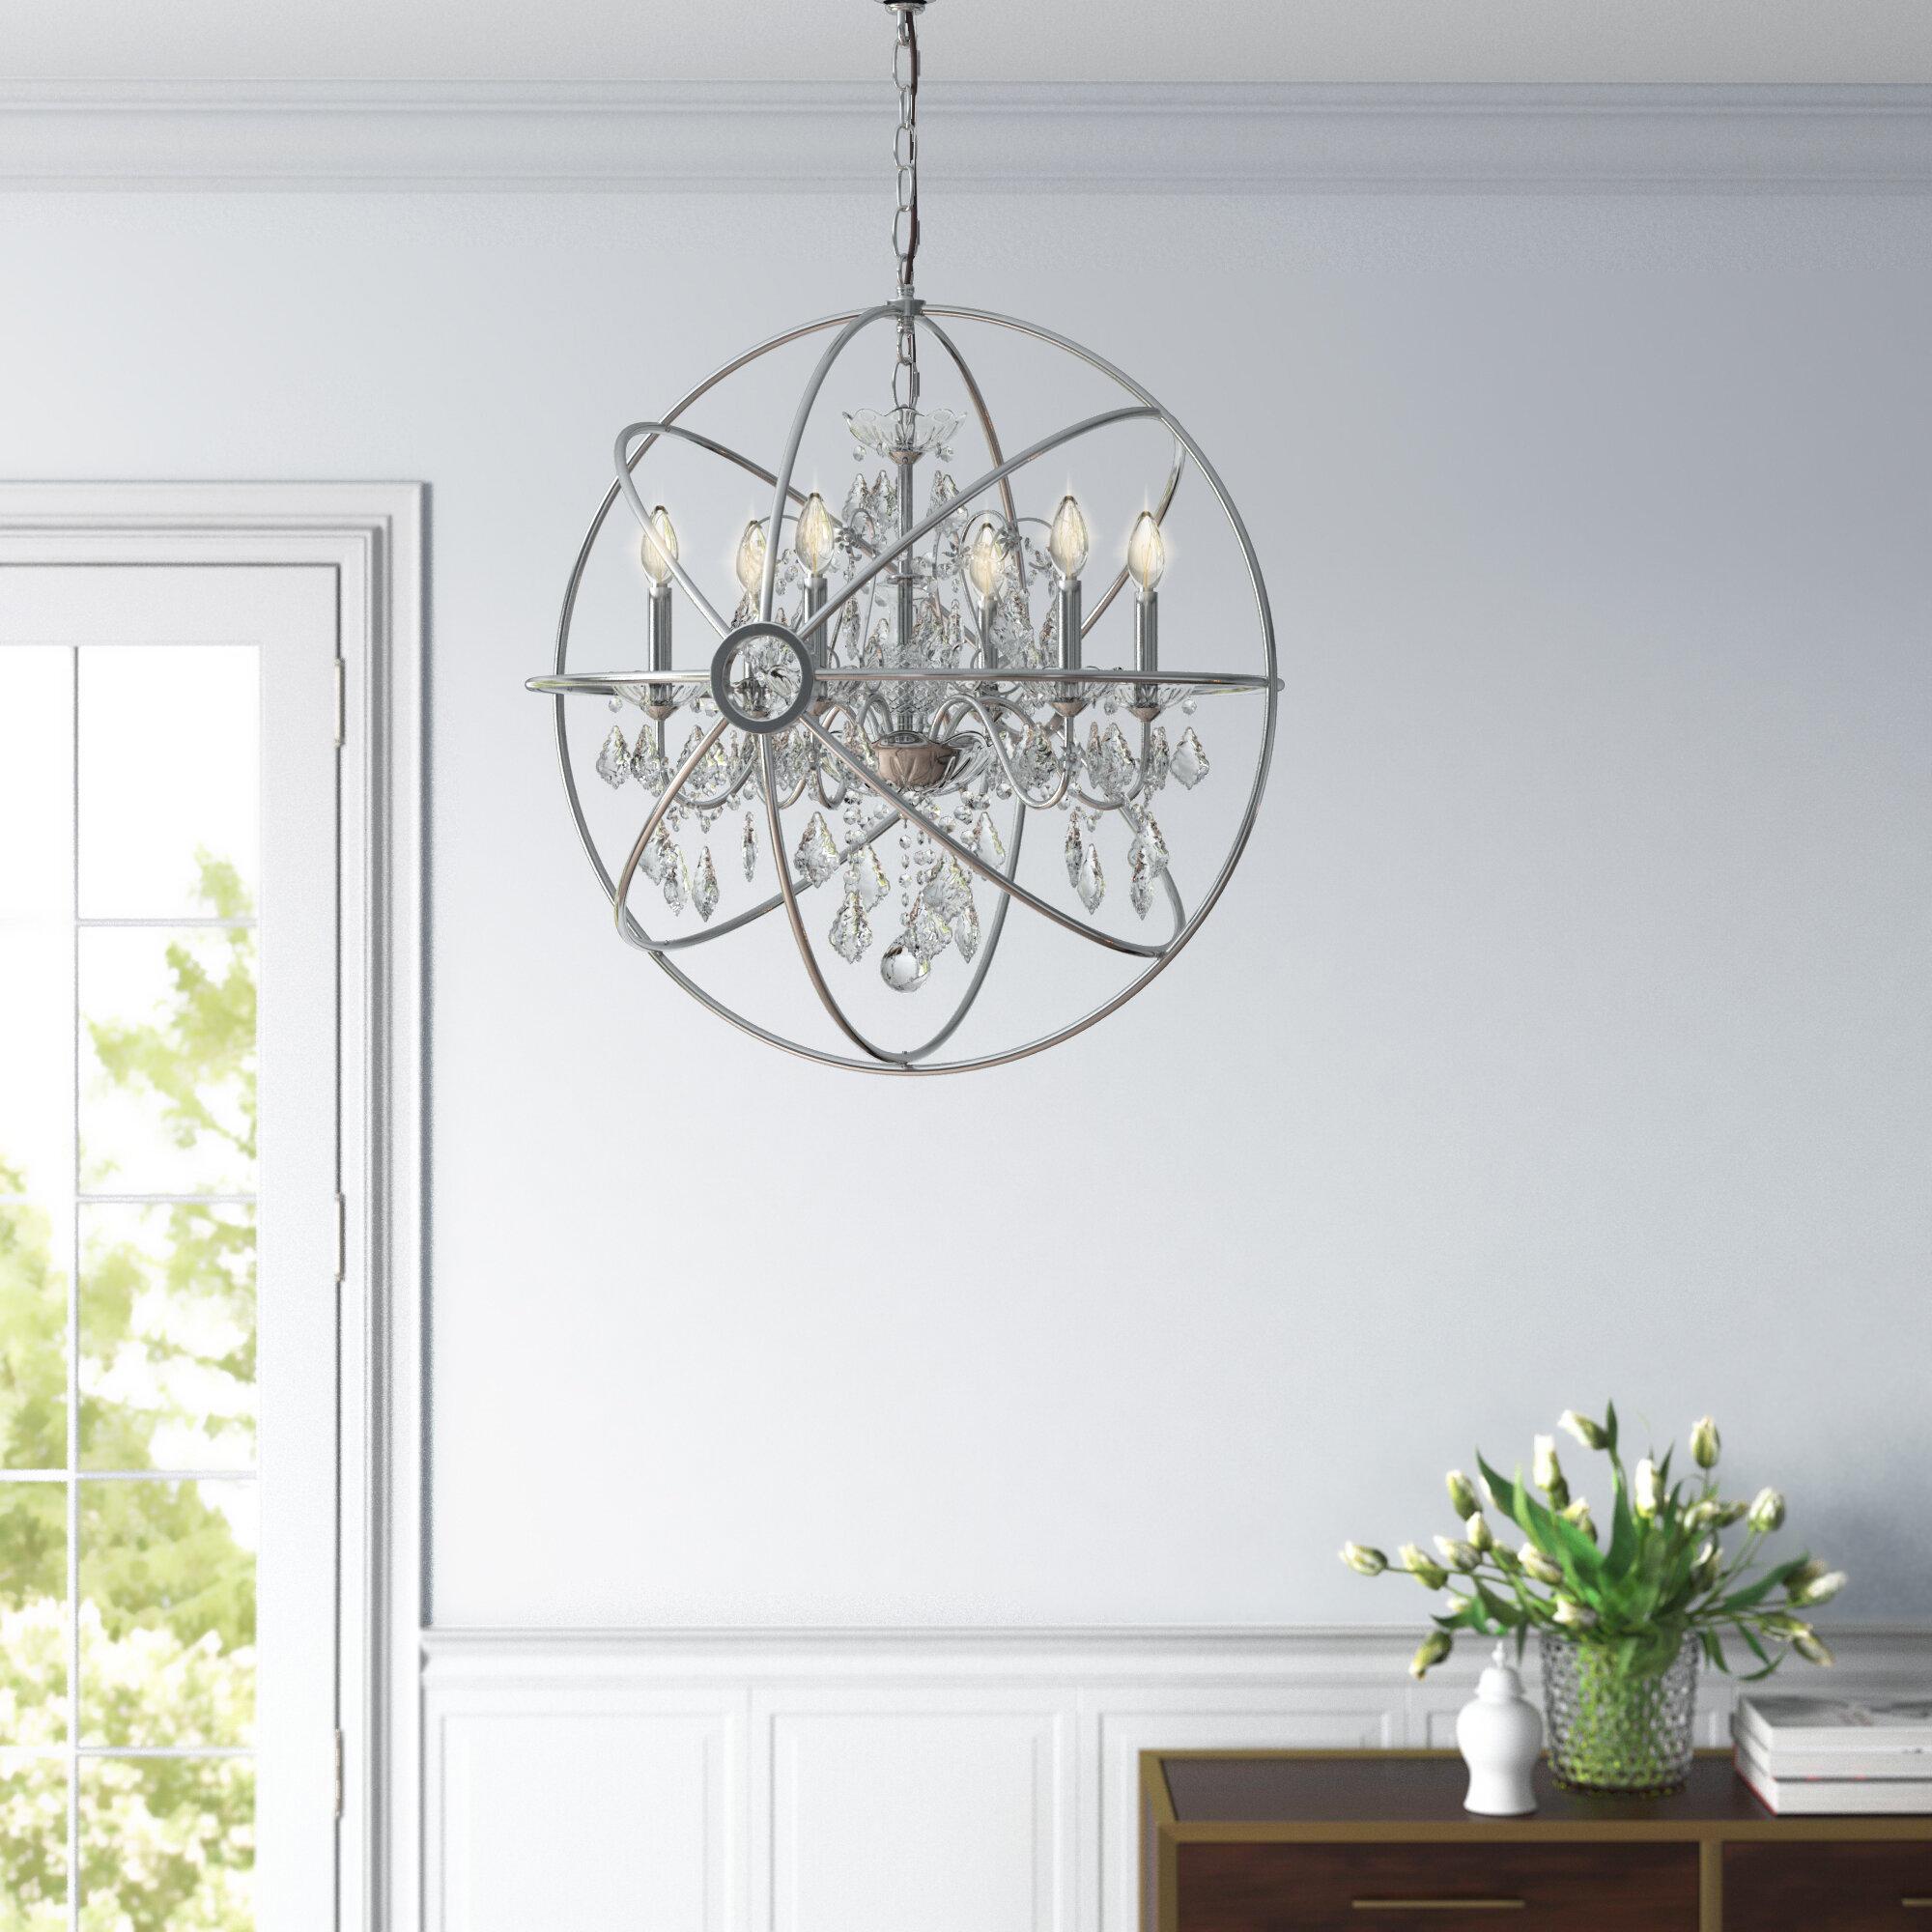 House Of Hampton Clifton 6 Light Candle Style Globe Chandelier Reviews Wayfair Ca